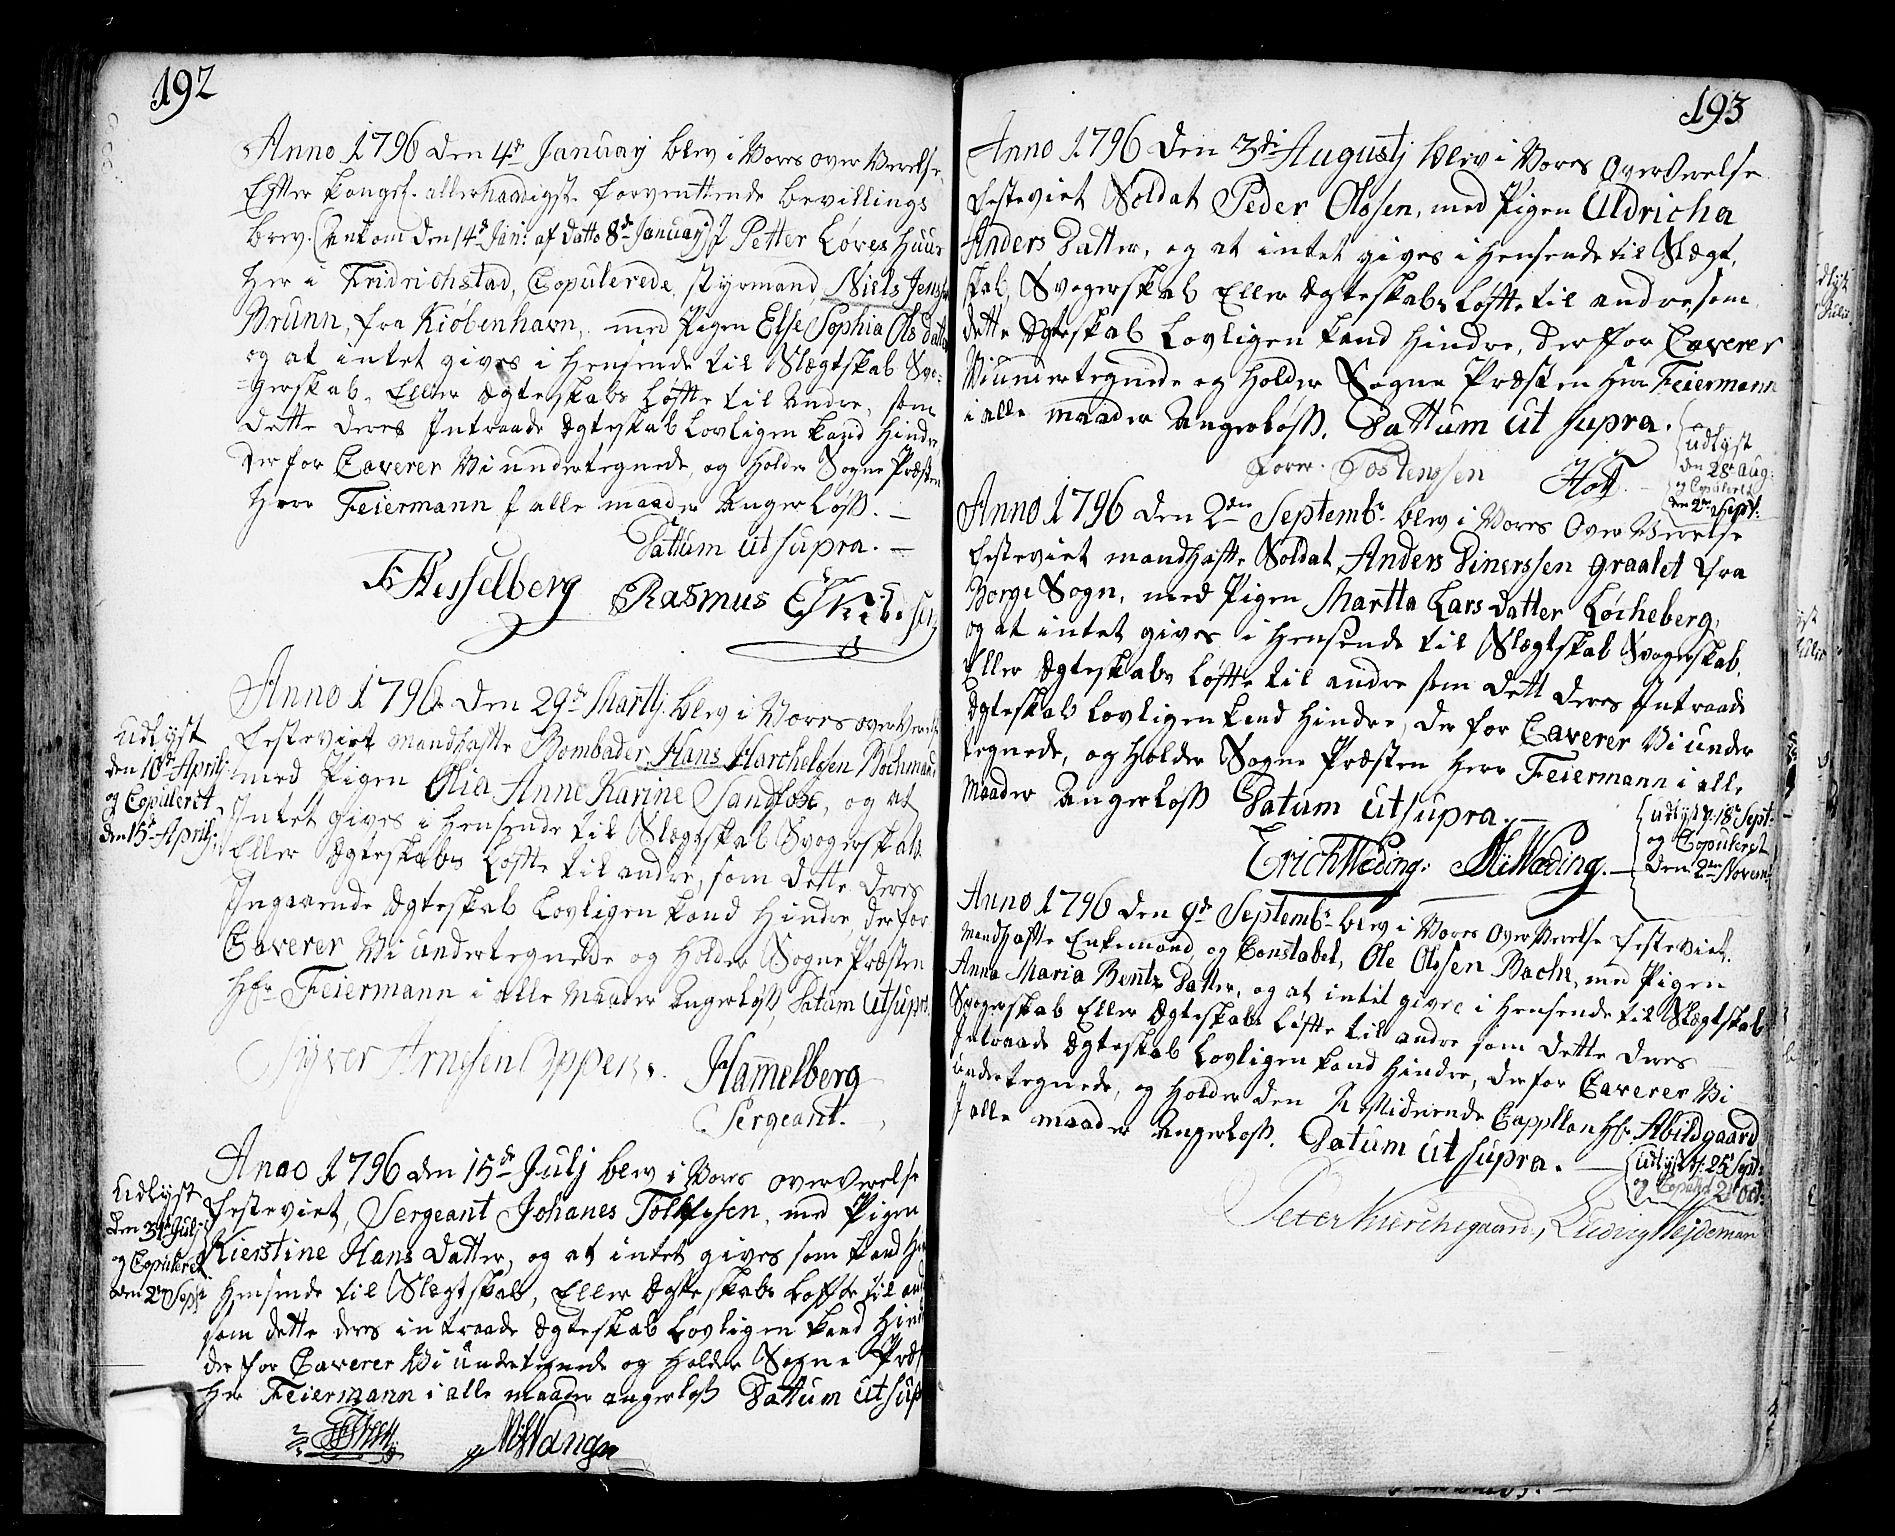 SAO, Fredrikstad prestekontor Kirkebøker, F/Fa/L0002: Ministerialbok nr. 2, 1750-1804, s. 192-193